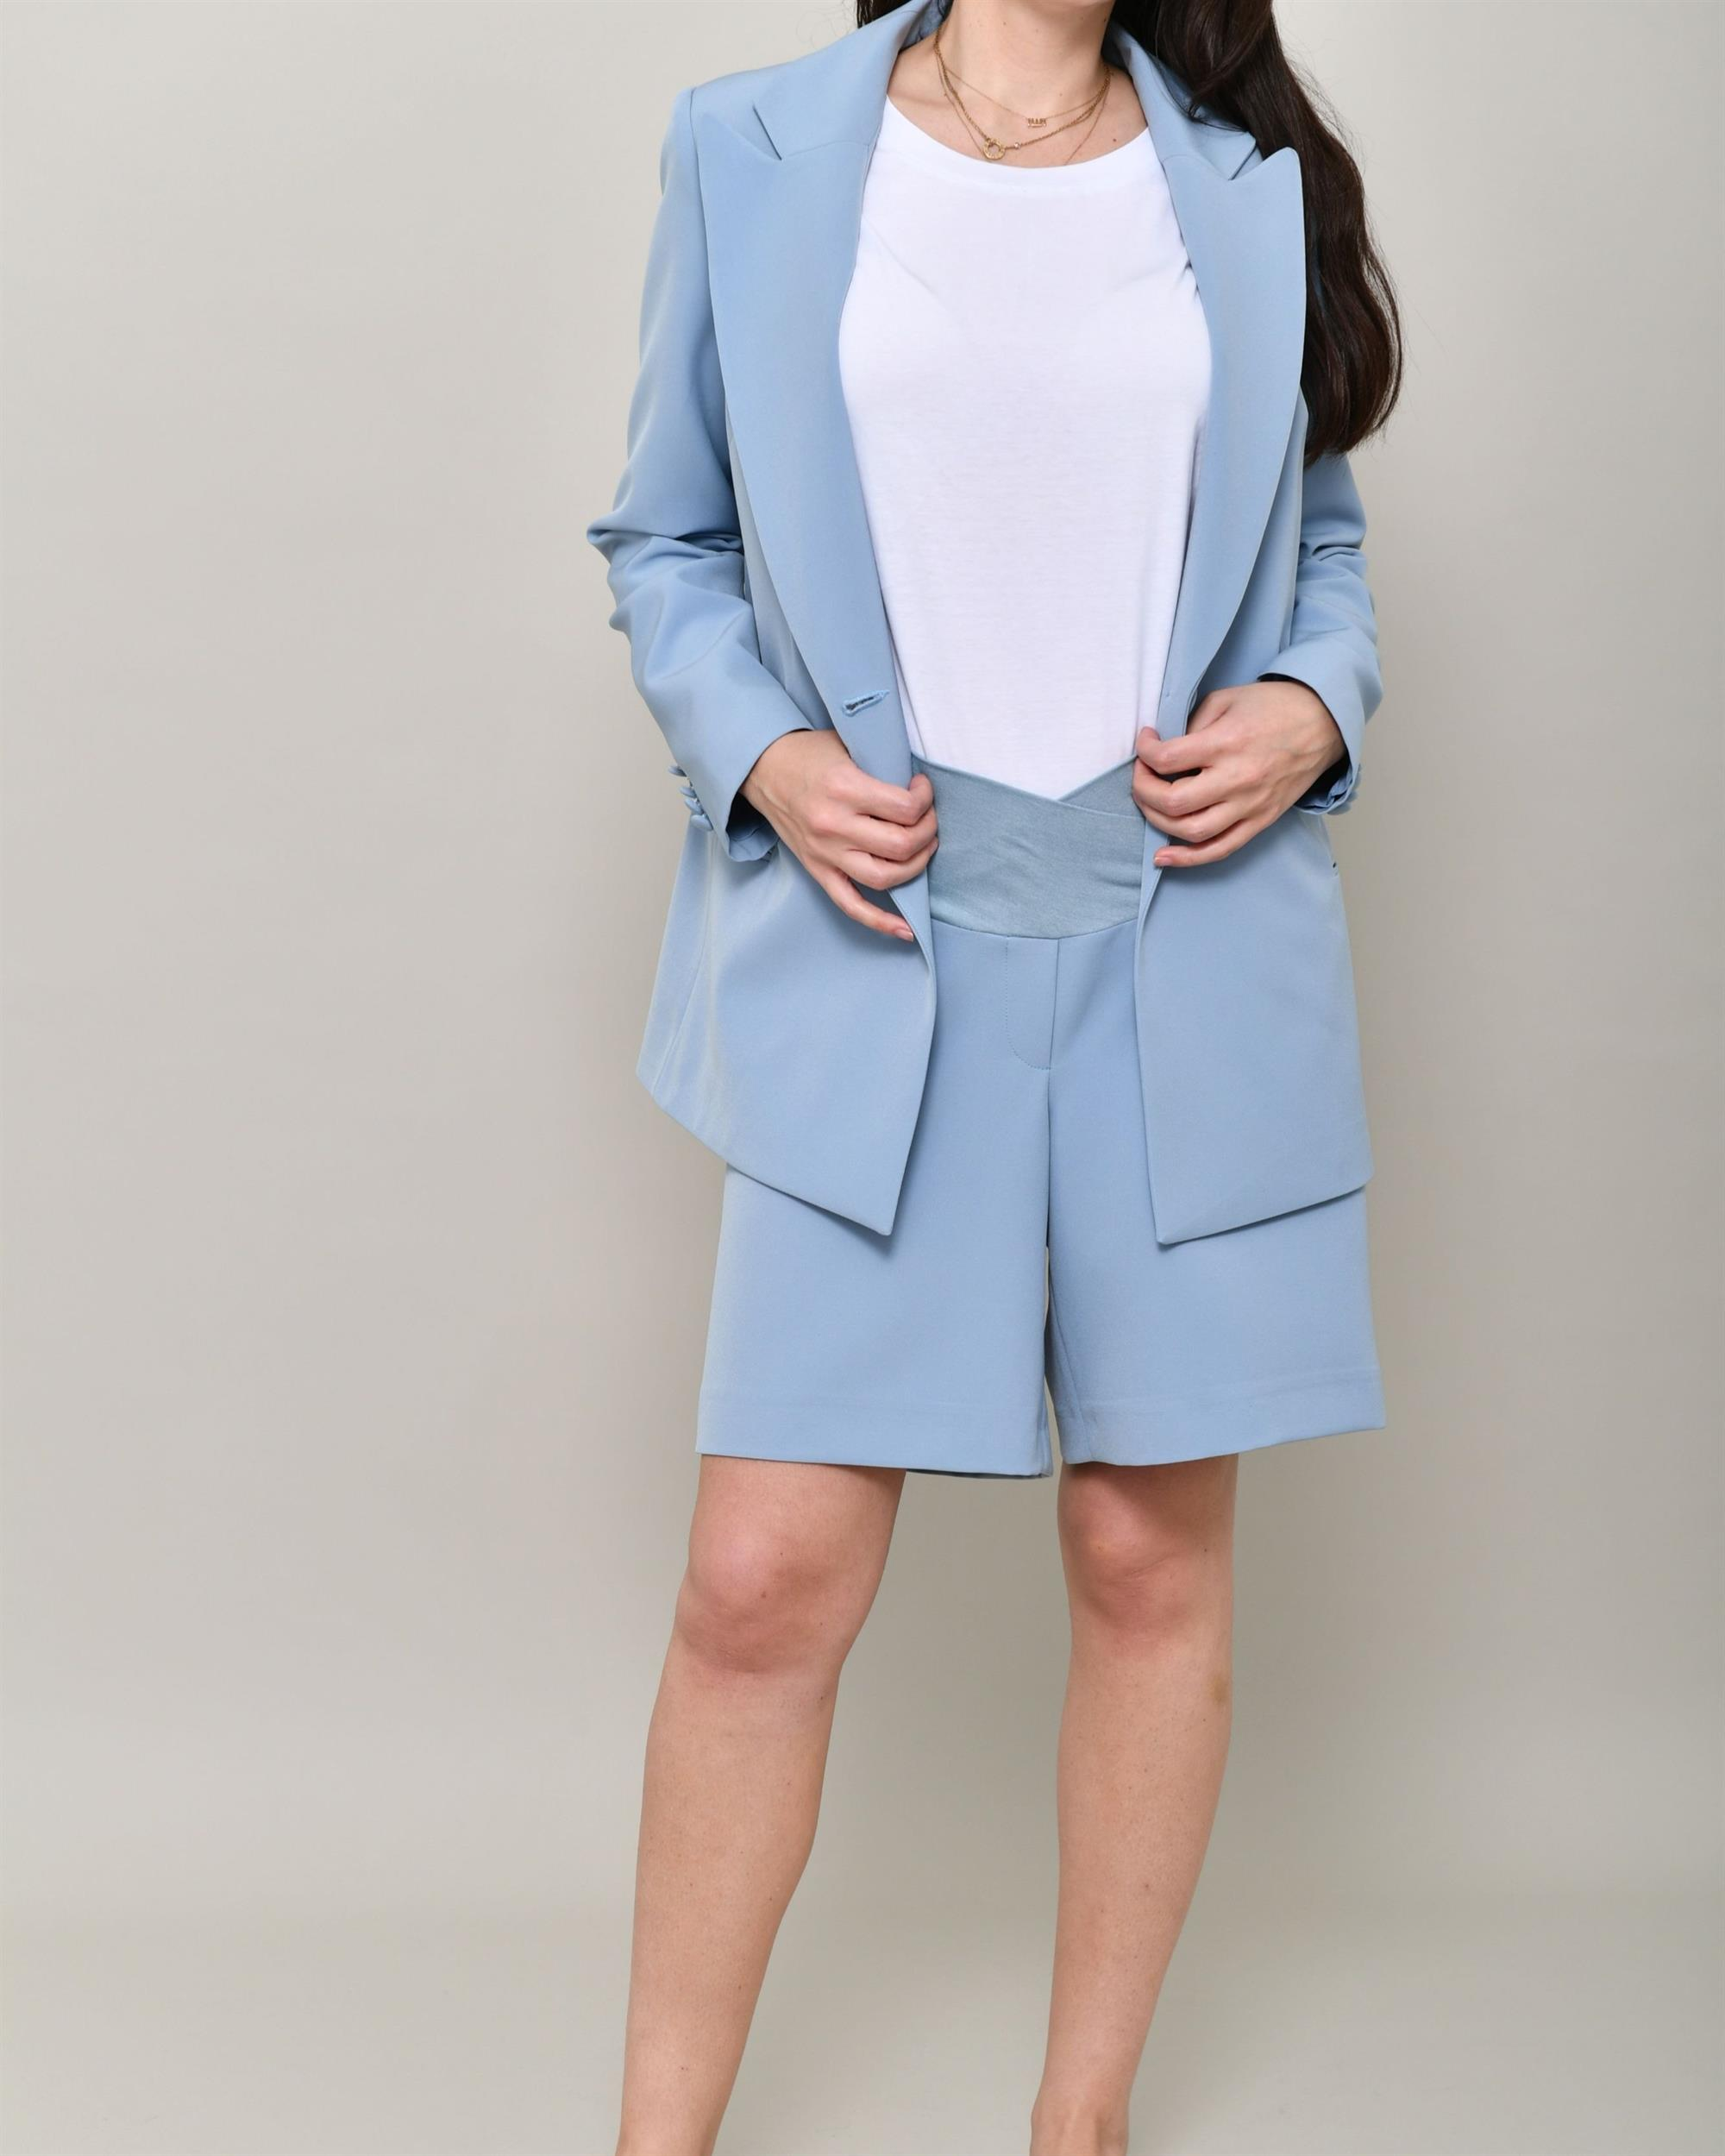 xl blue vest short set minimal bright blue matching set 90s blue 2 piece gaucho shorts set romper set minimalist summer suit